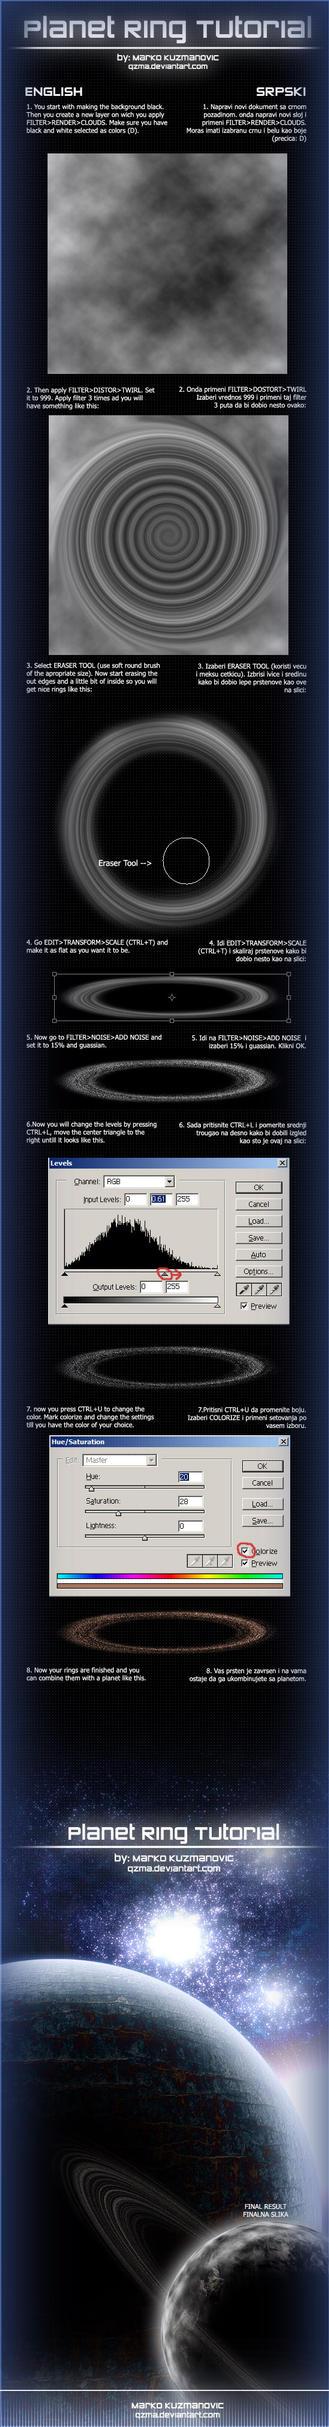 Planet Ring Tutorial by Qzma